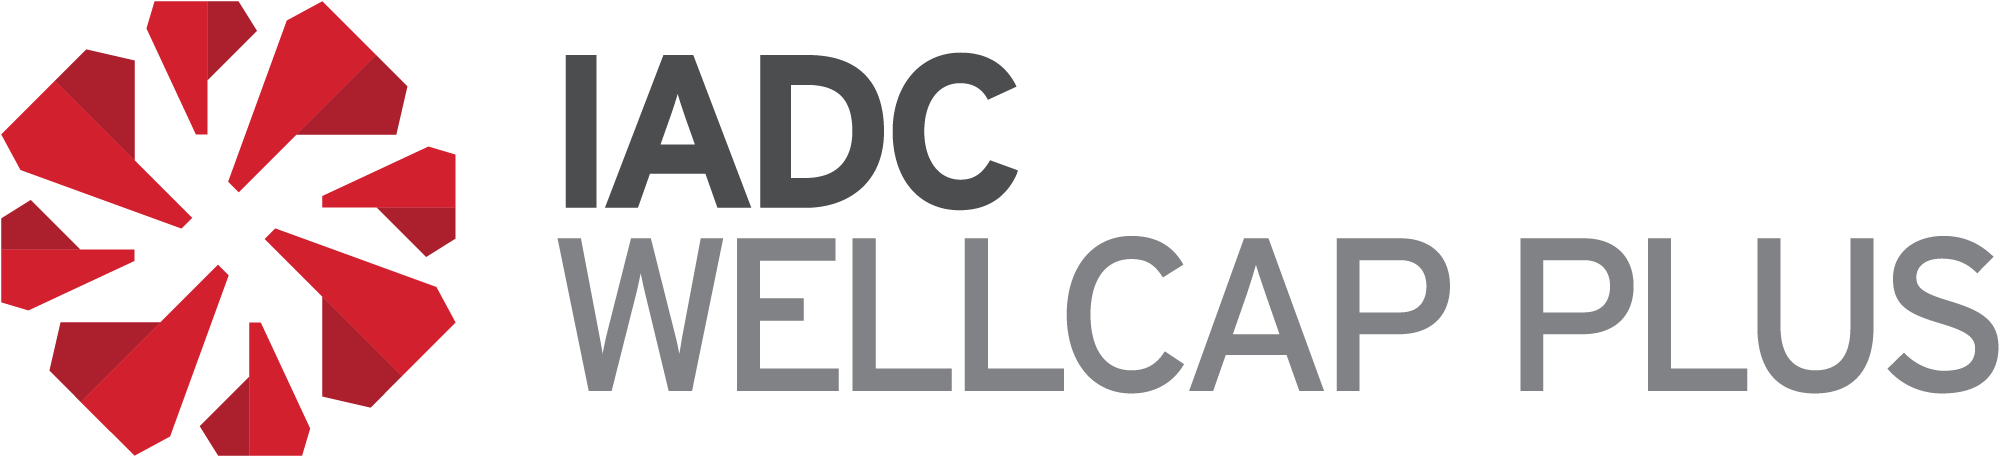 WellCAP Plus logo